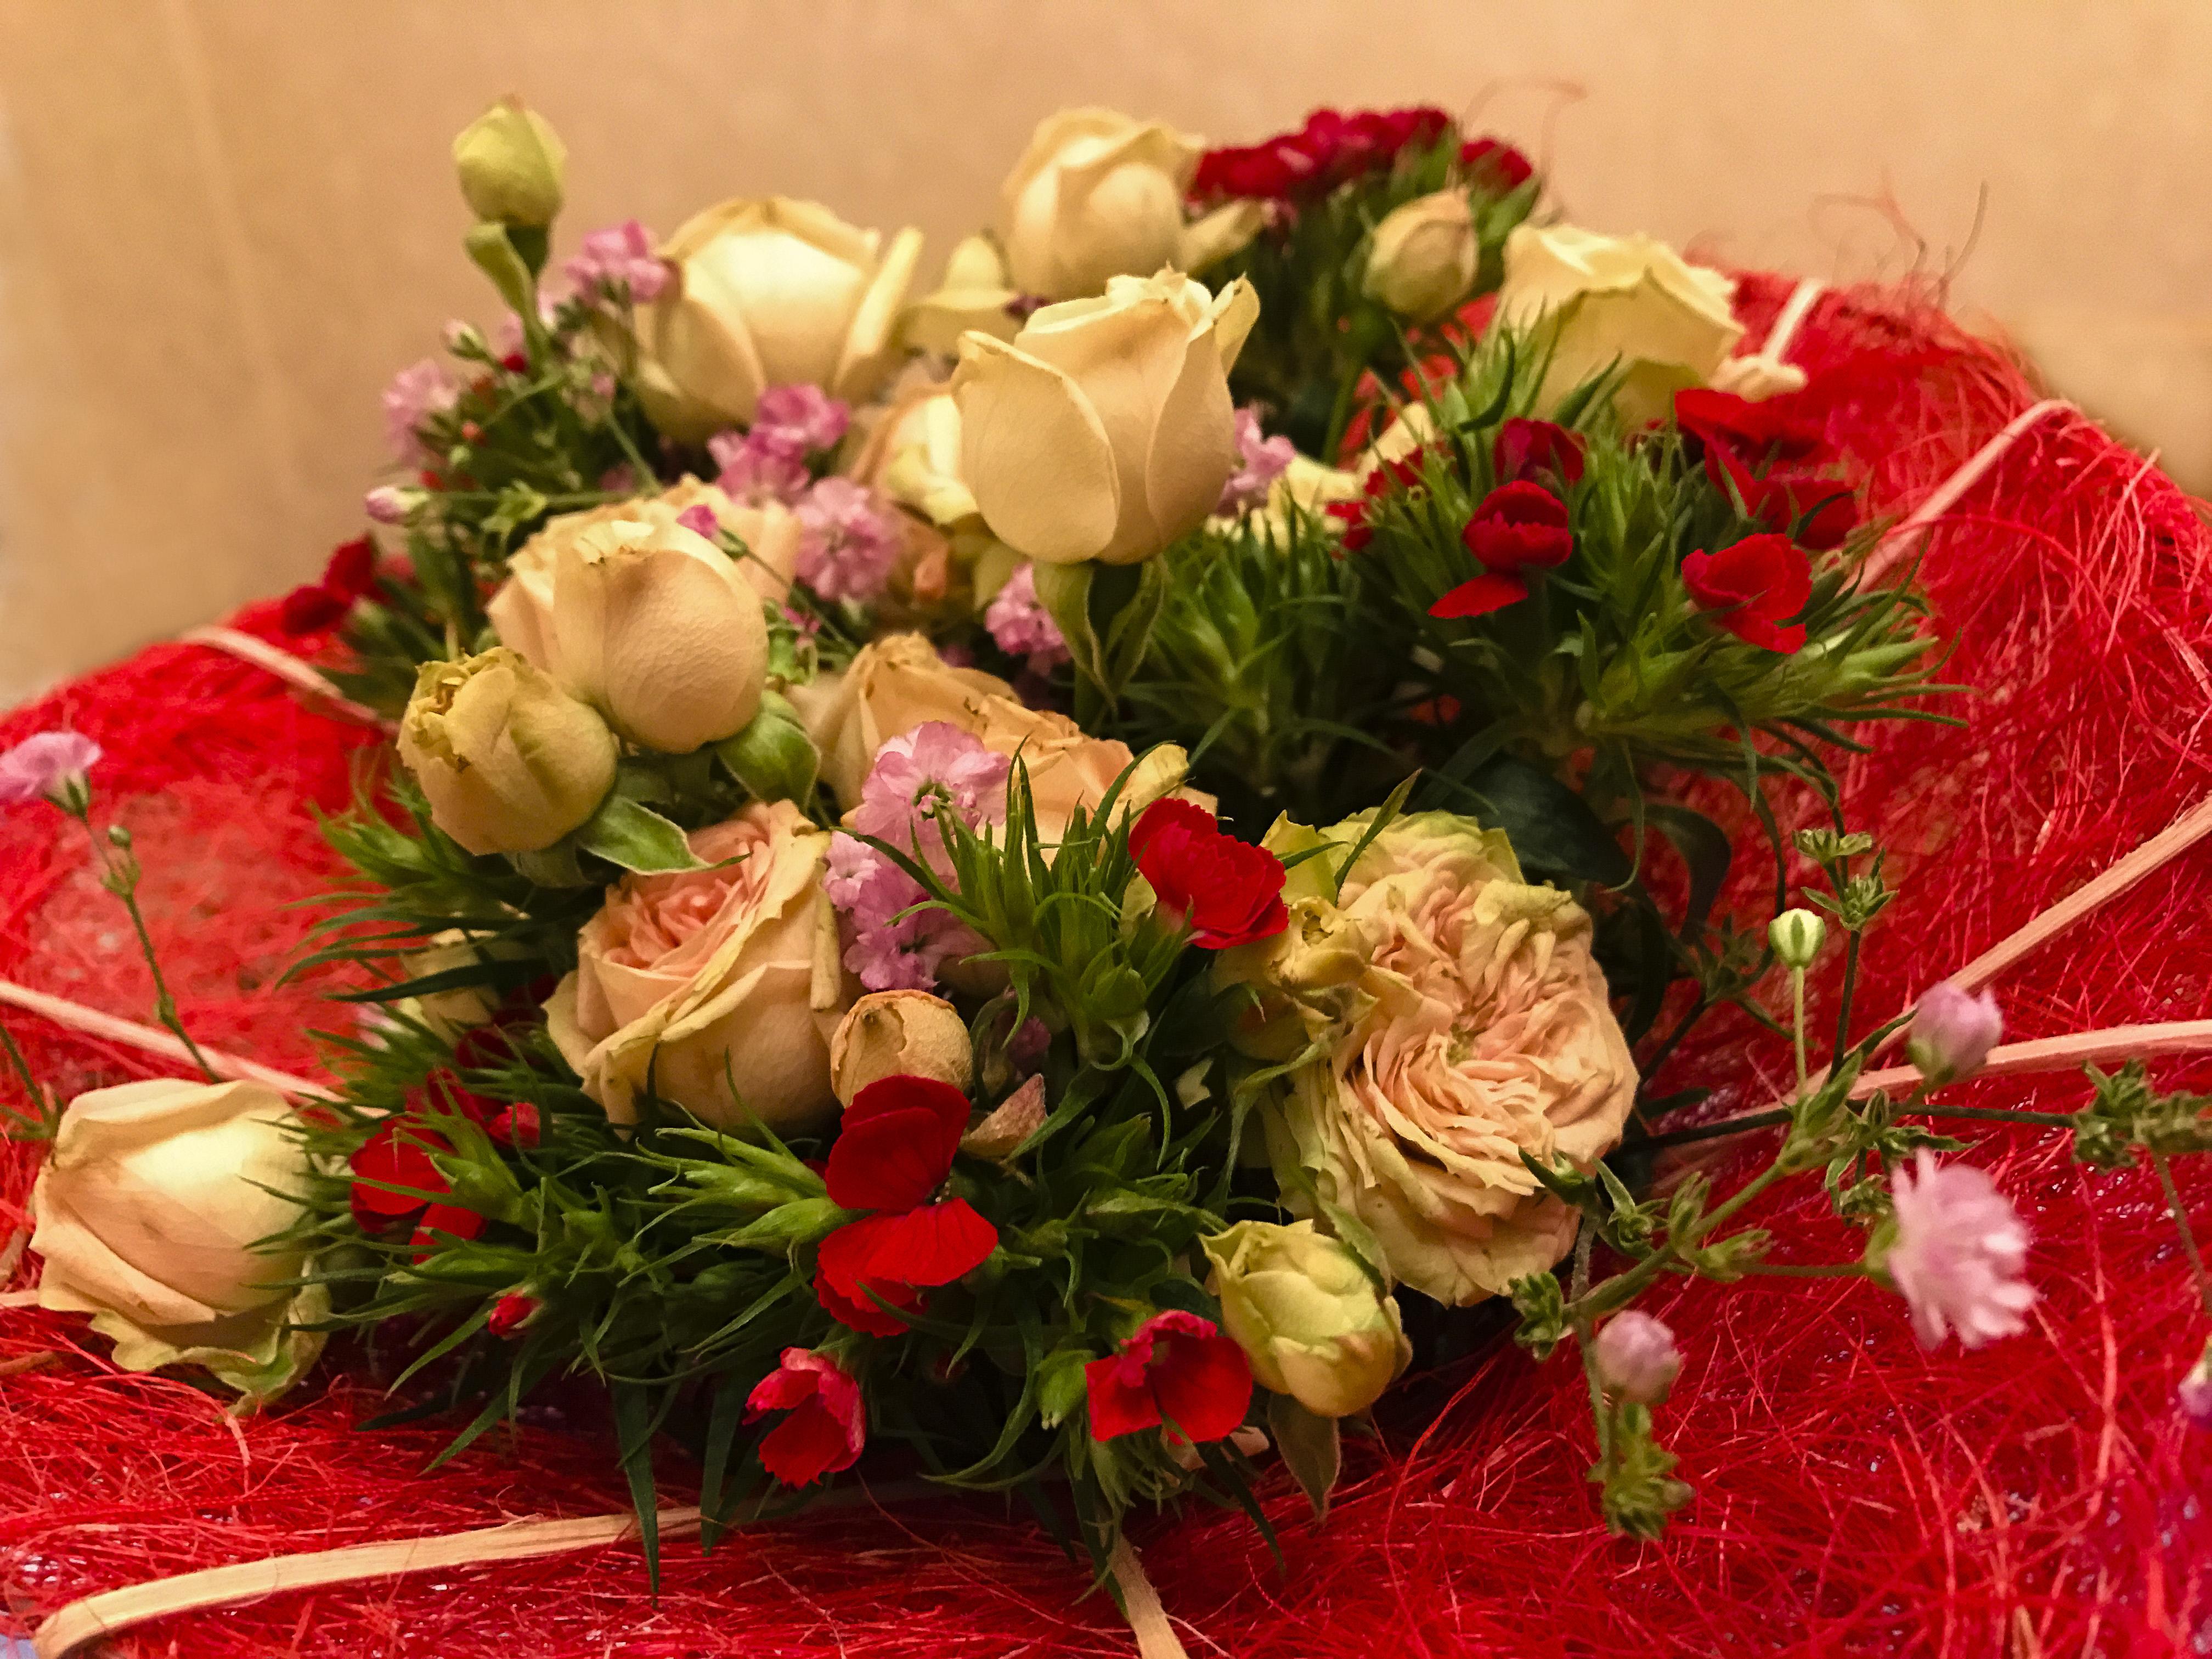 Fondos De Pantalla Flores Enamorado Manzana Iphone 7 Mas